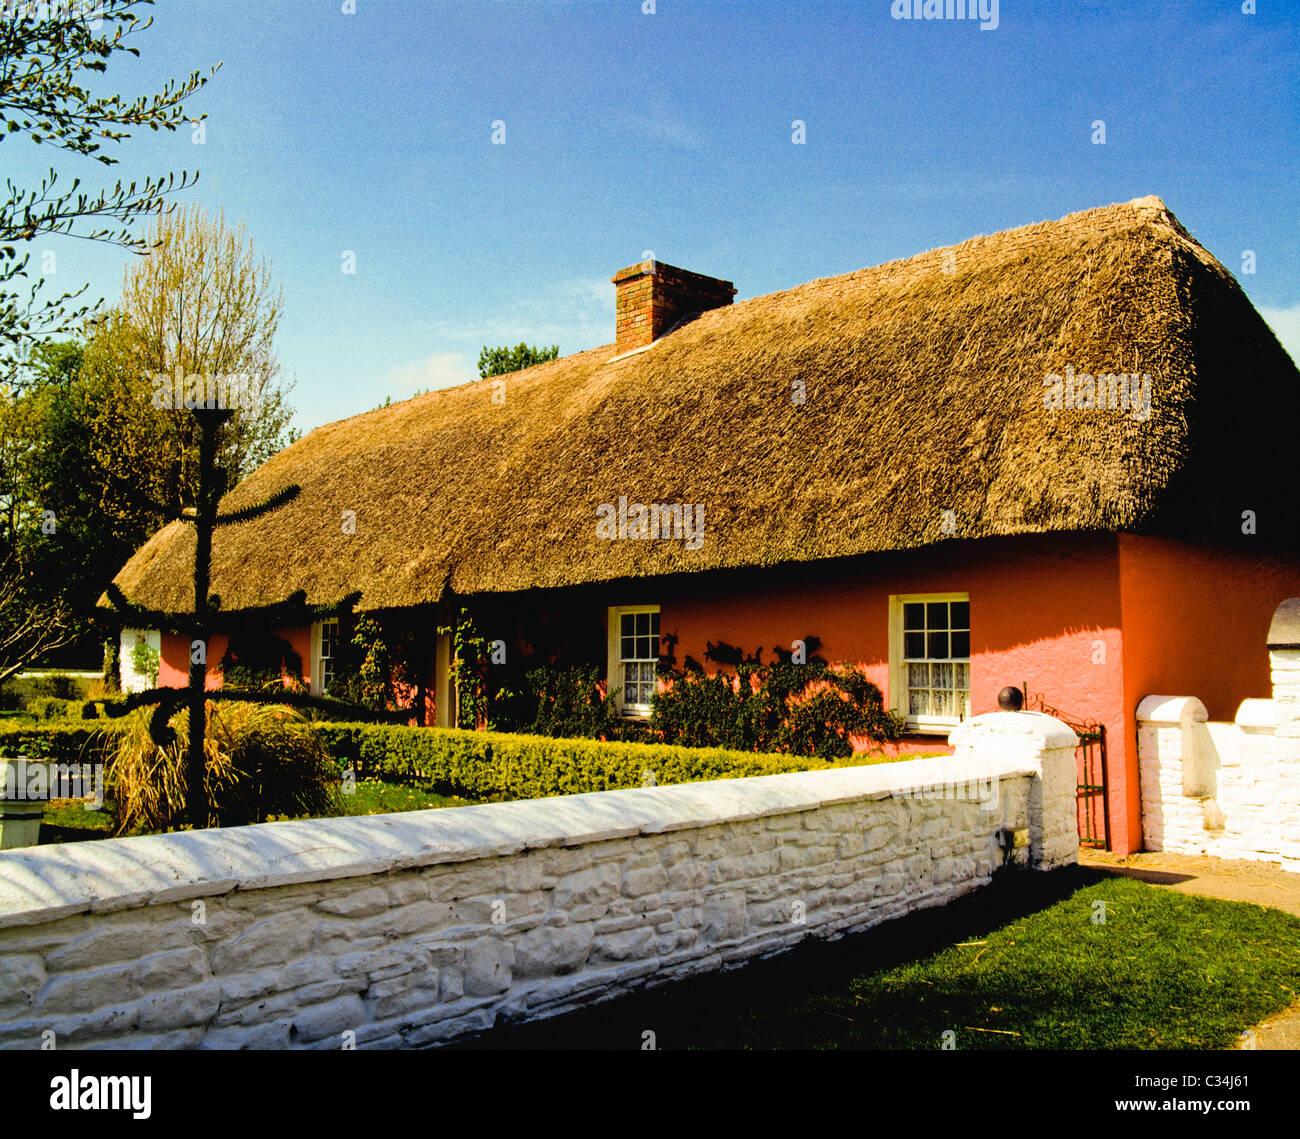 Shannon, Co Clare, Ireland, Bunratty Folk Park - Stock Image